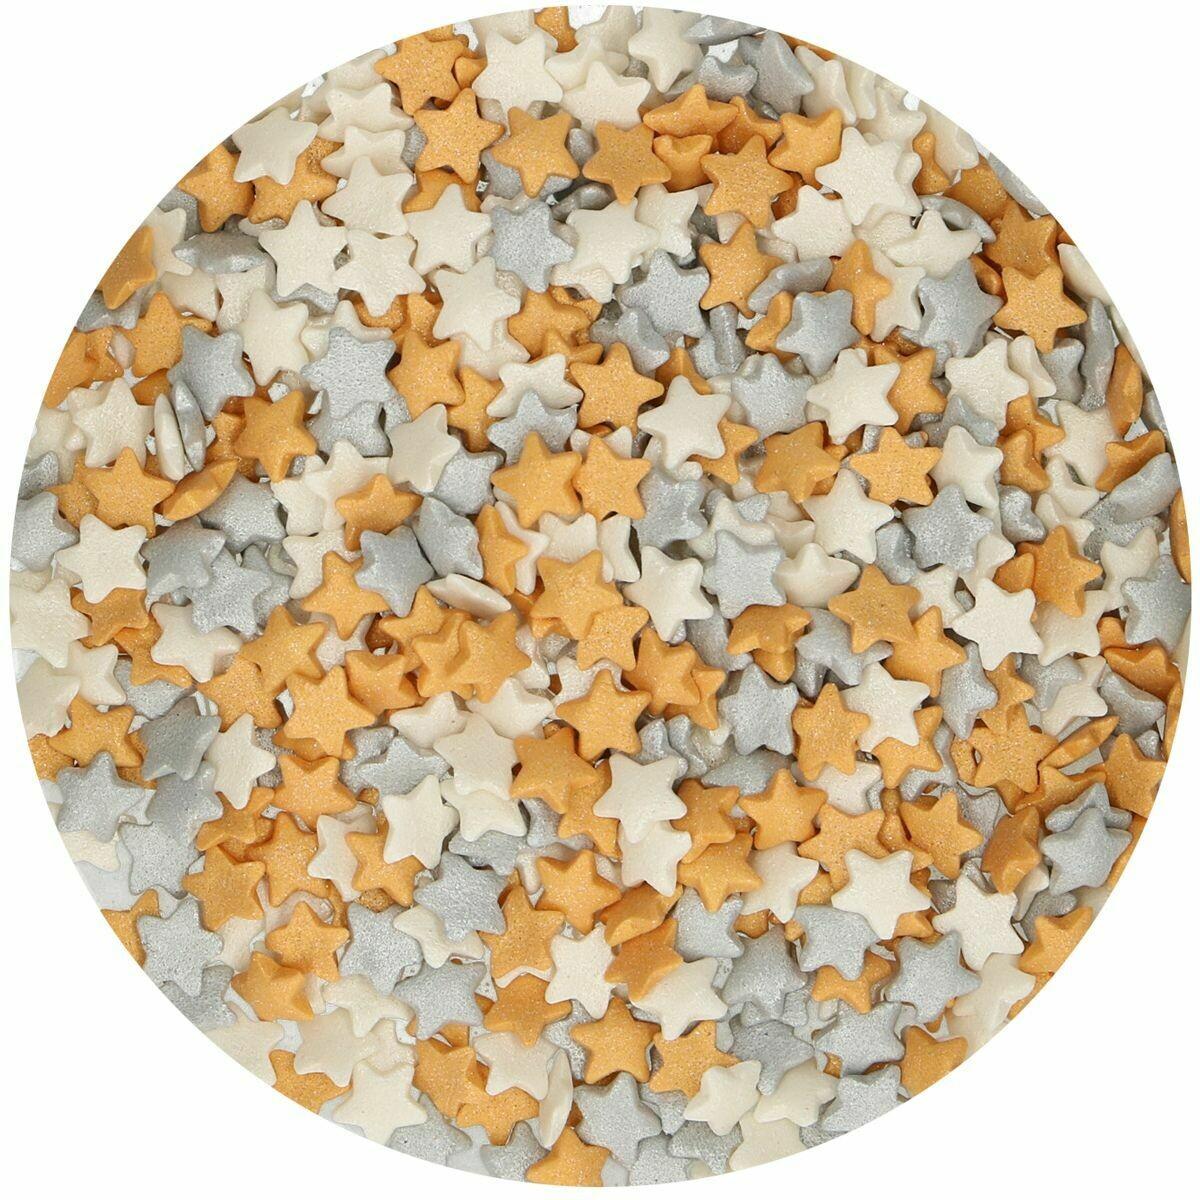 FunCakes Sprinkles -STARS -MIXED SIZED -GOLD & SILVER -Ζαχαρωτά  Χρυσά και Ασημί Αστέρια 60γρ